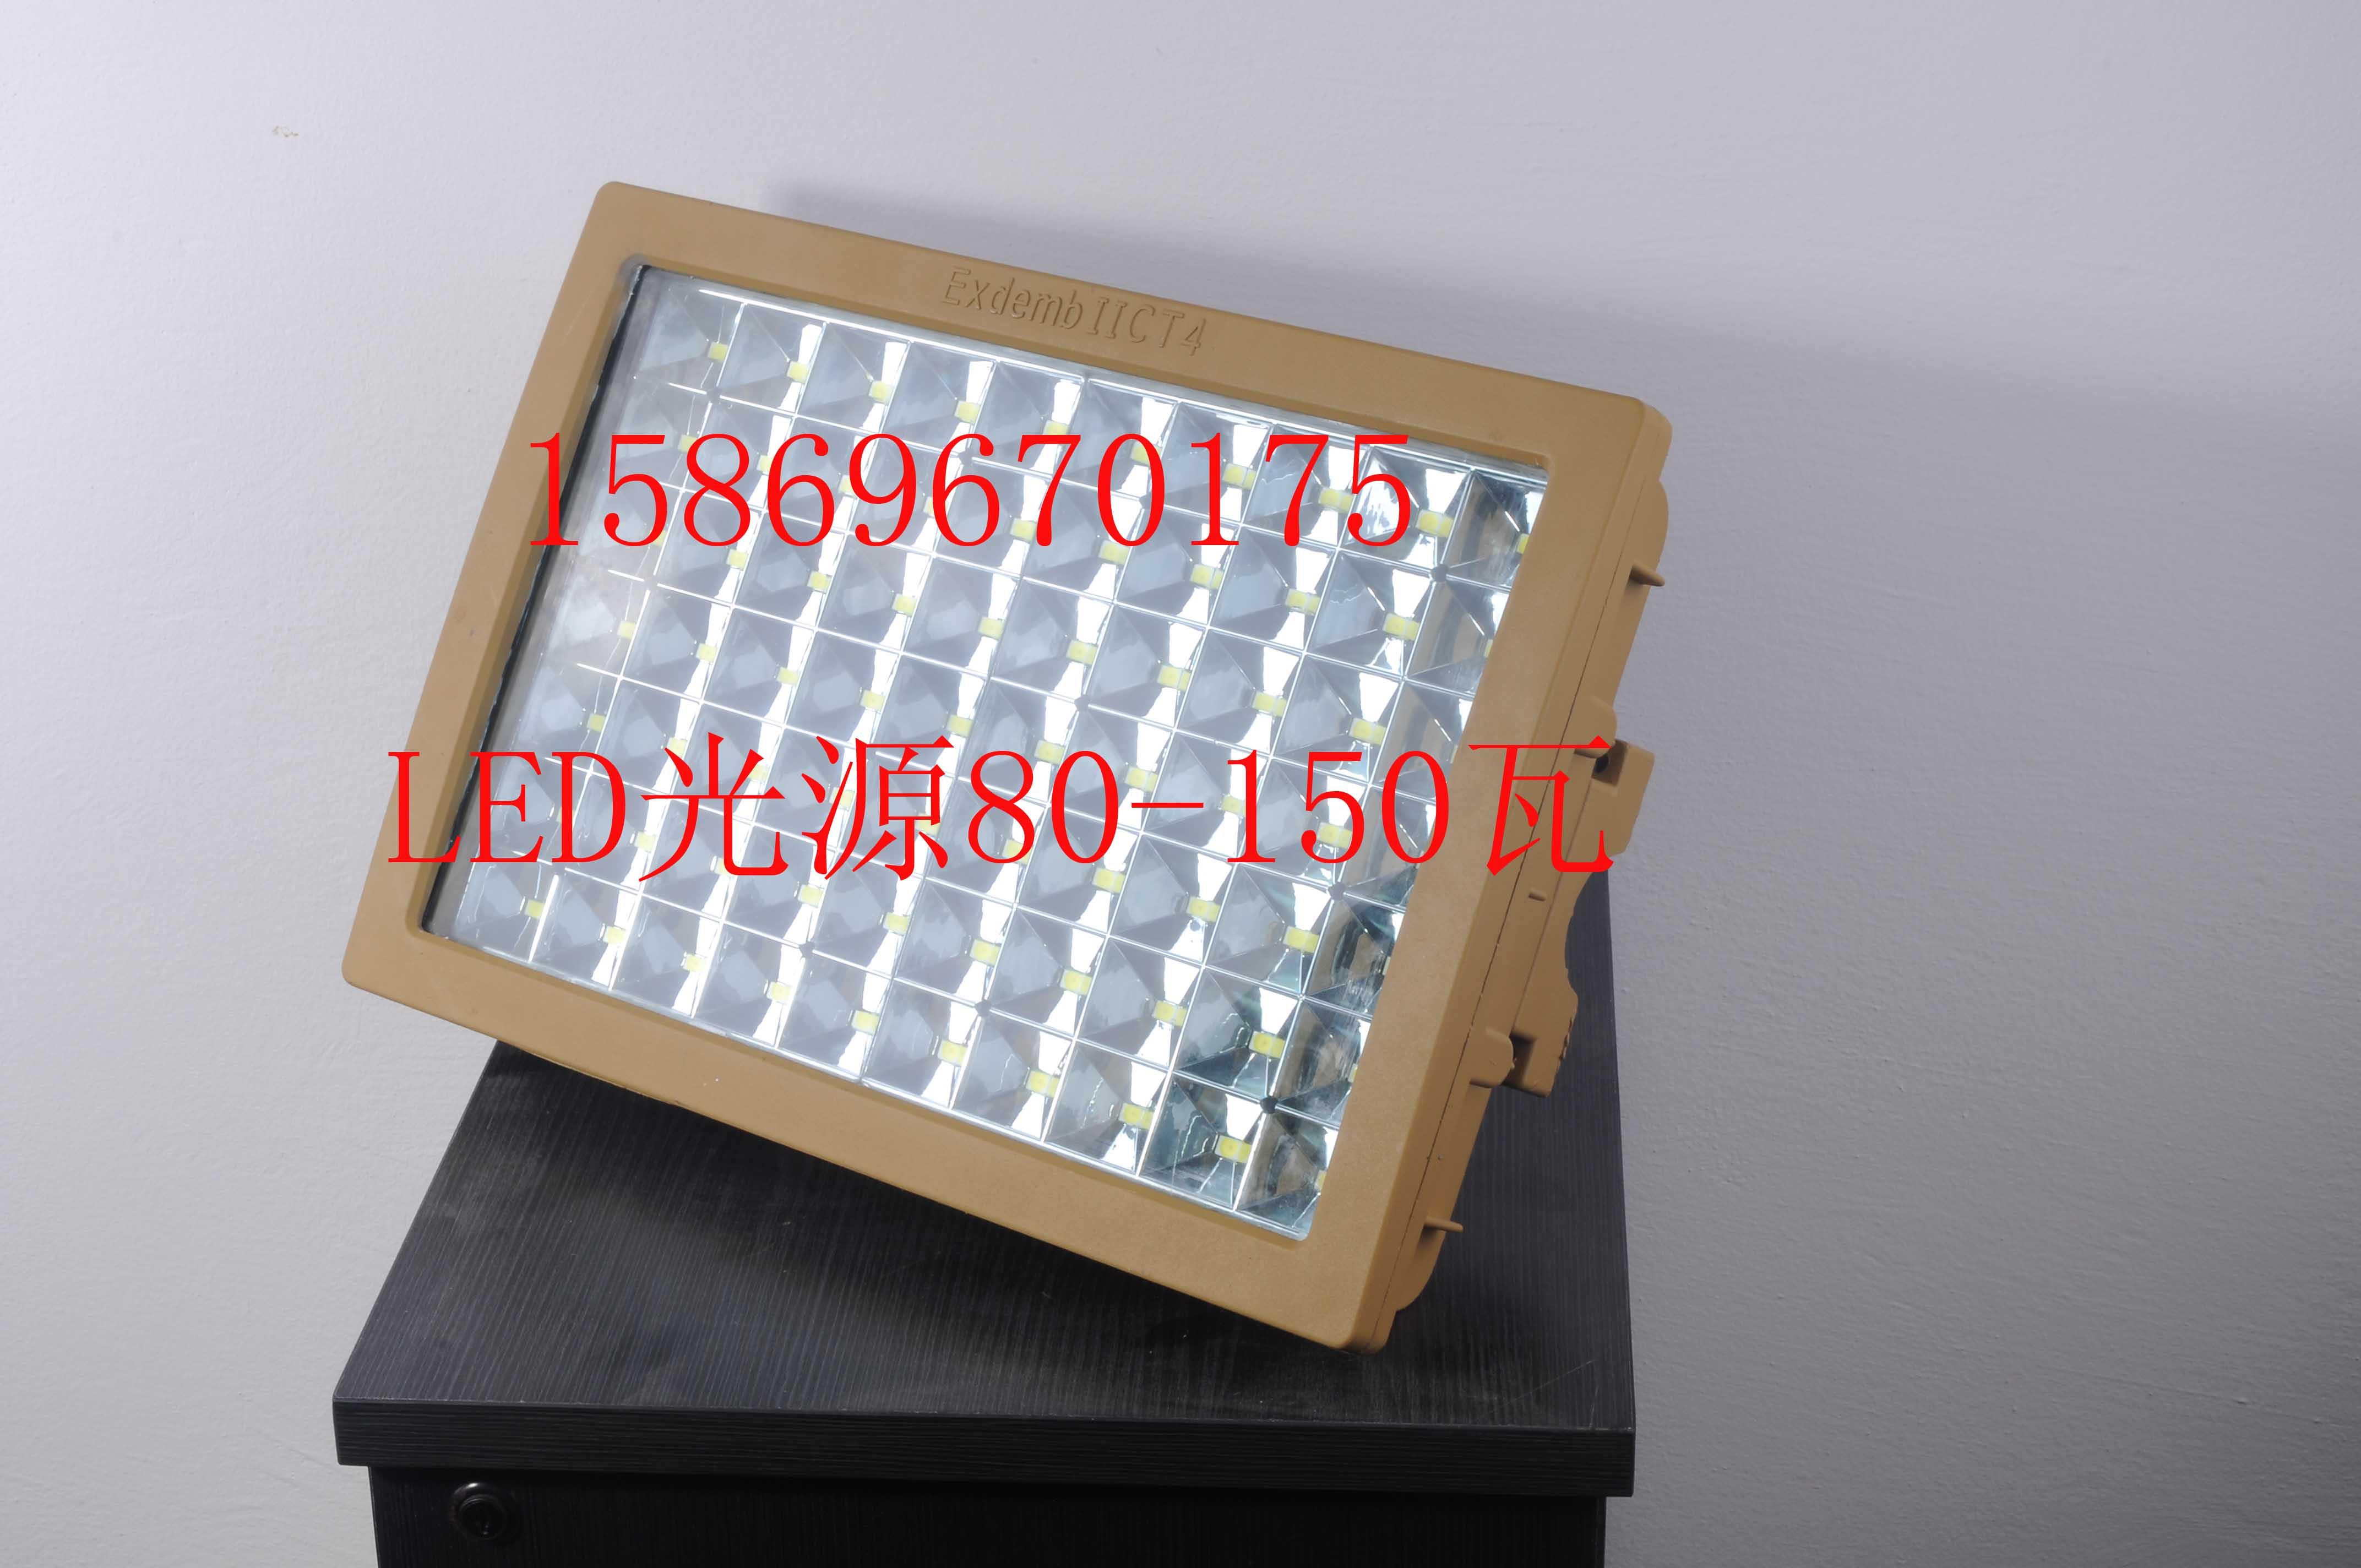 - LED100W latern, led - lambi integreeritud 140 - 150 w w w - 200